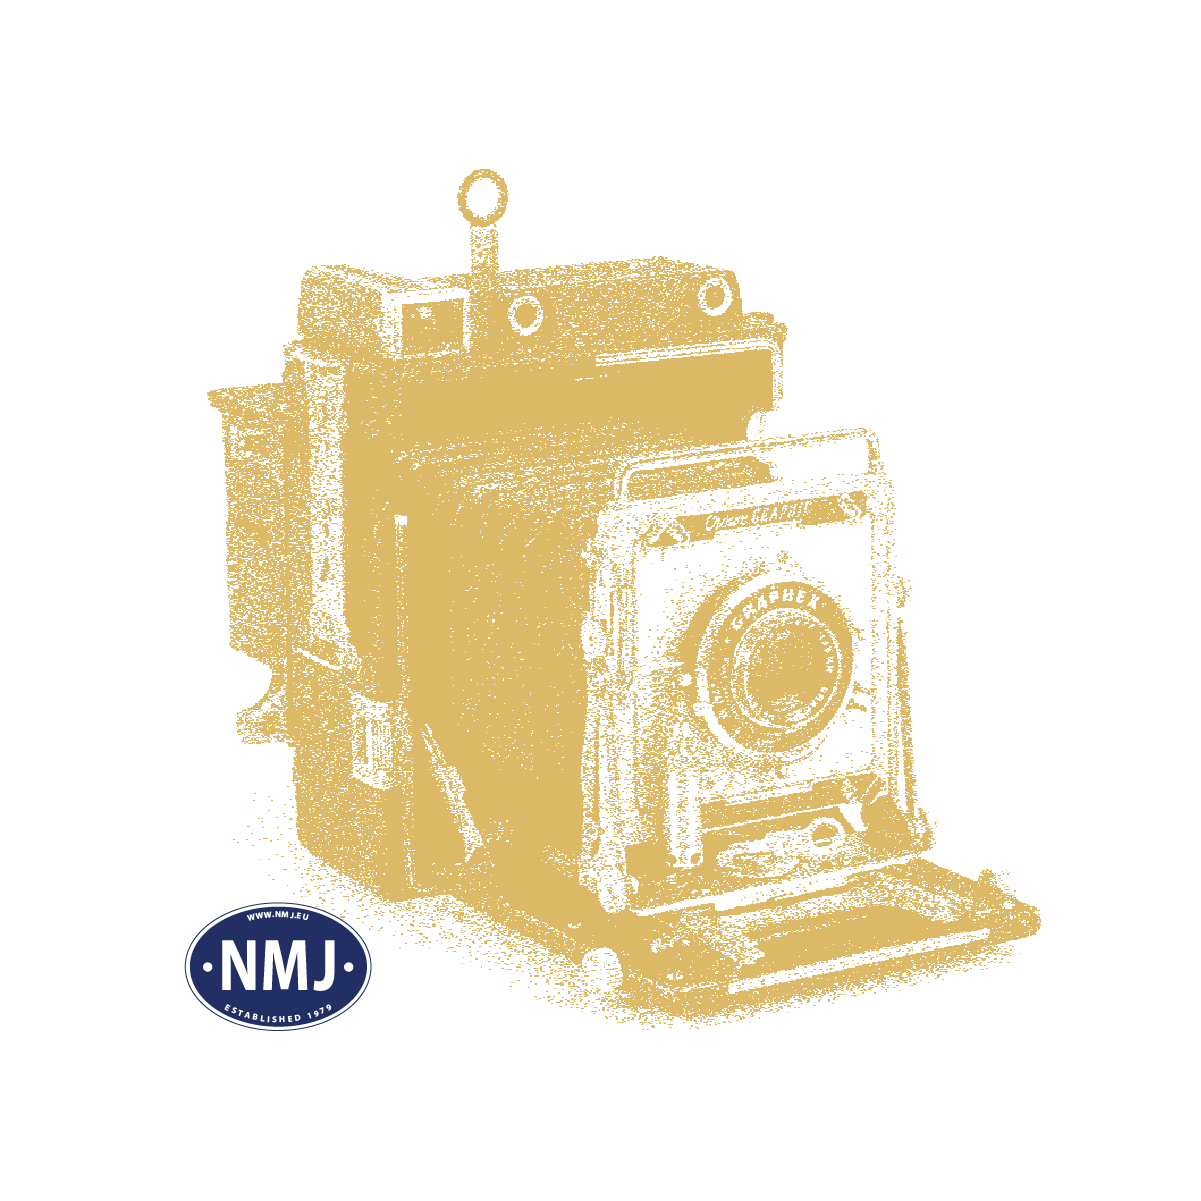 NMJT90019 - NMJ Topline NSB Di3a 617 Nydesign, DC